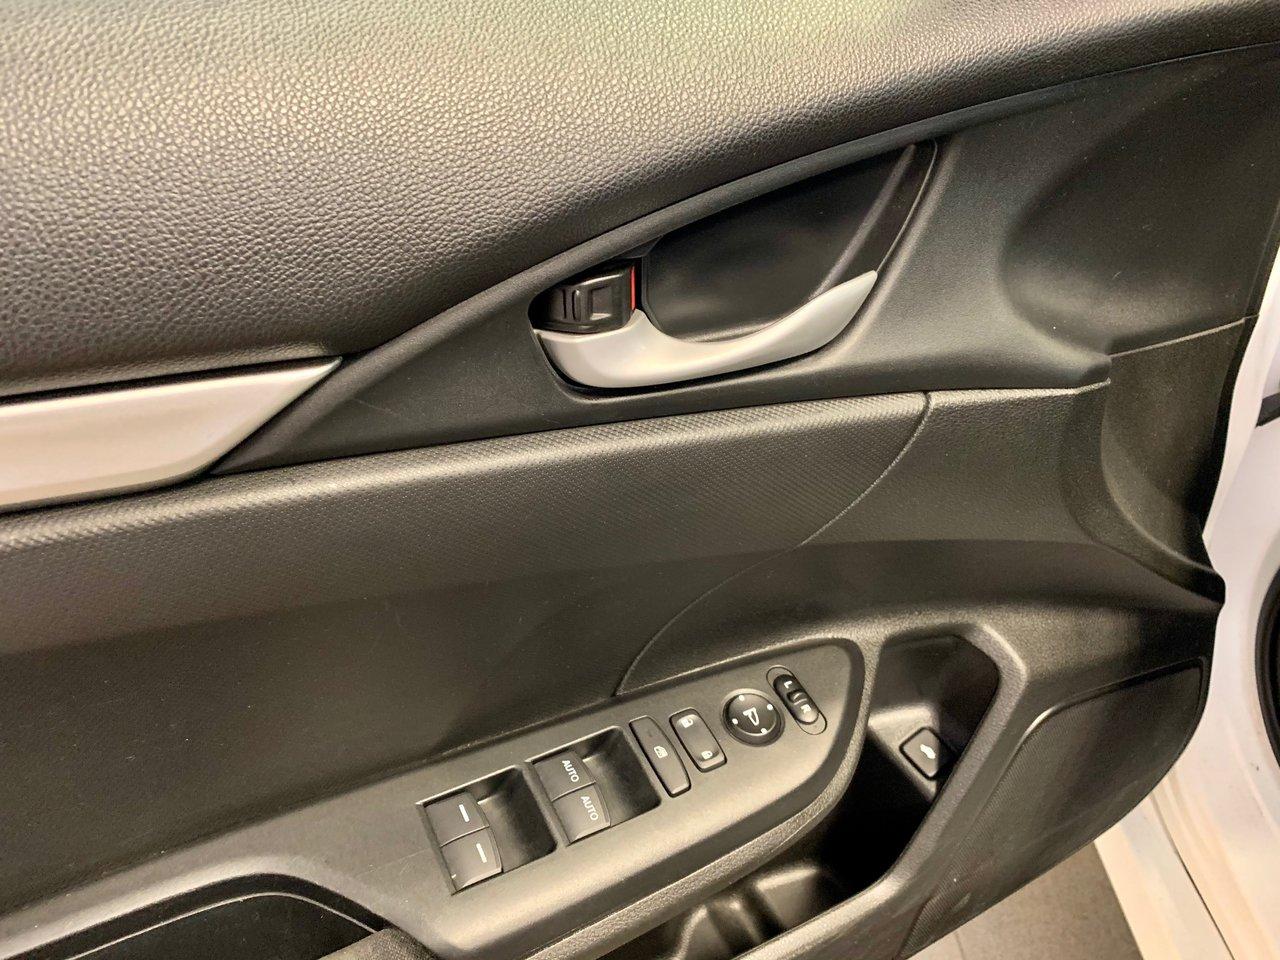 2017 Honda Civic Sedan LX / SIÈGES CHAUFFANTS + JAMAIS ACCIDENTÉE